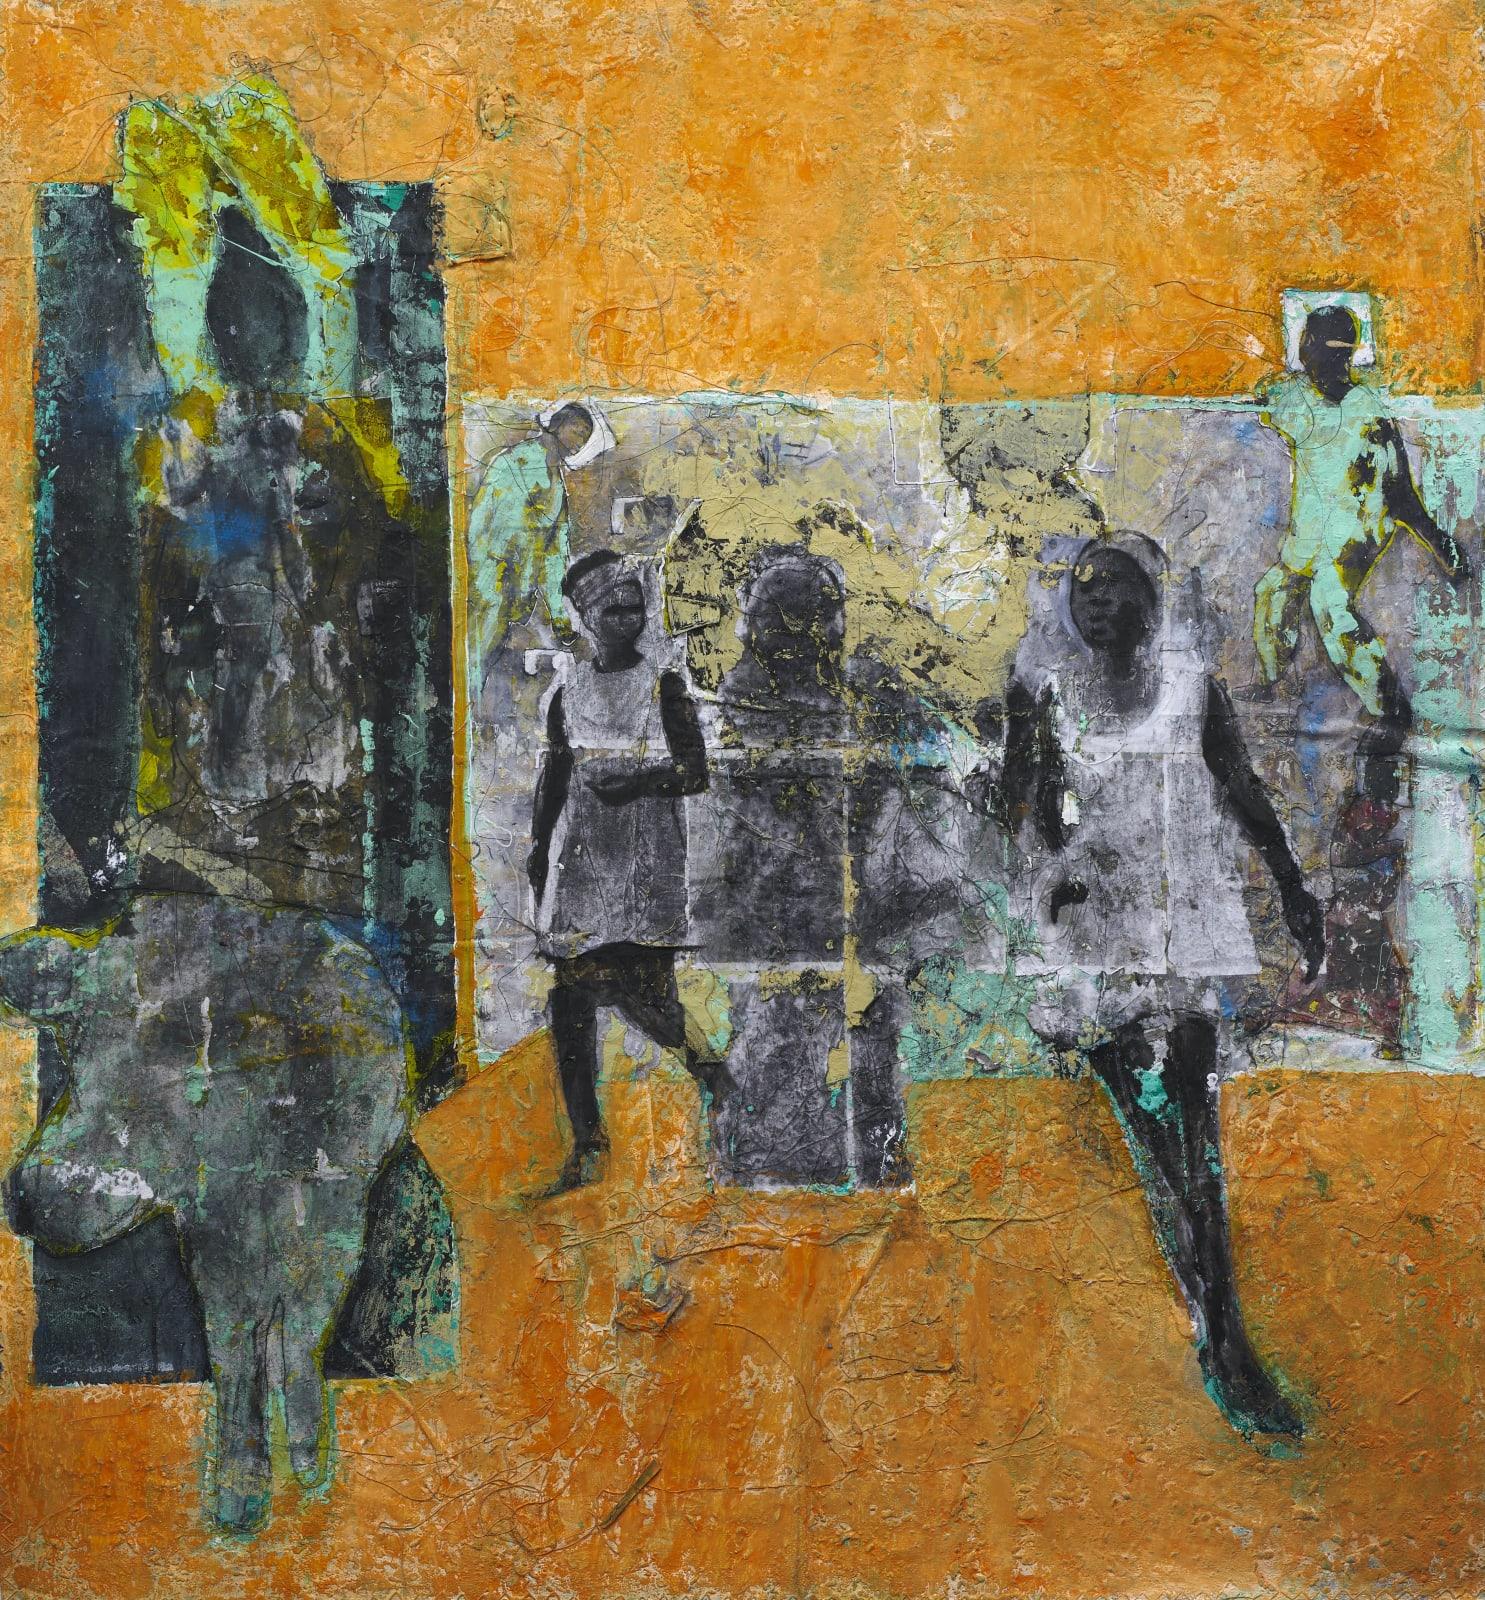 Kaloki Nyamai, Tumete Chatene (Came From The Meeting), 2021